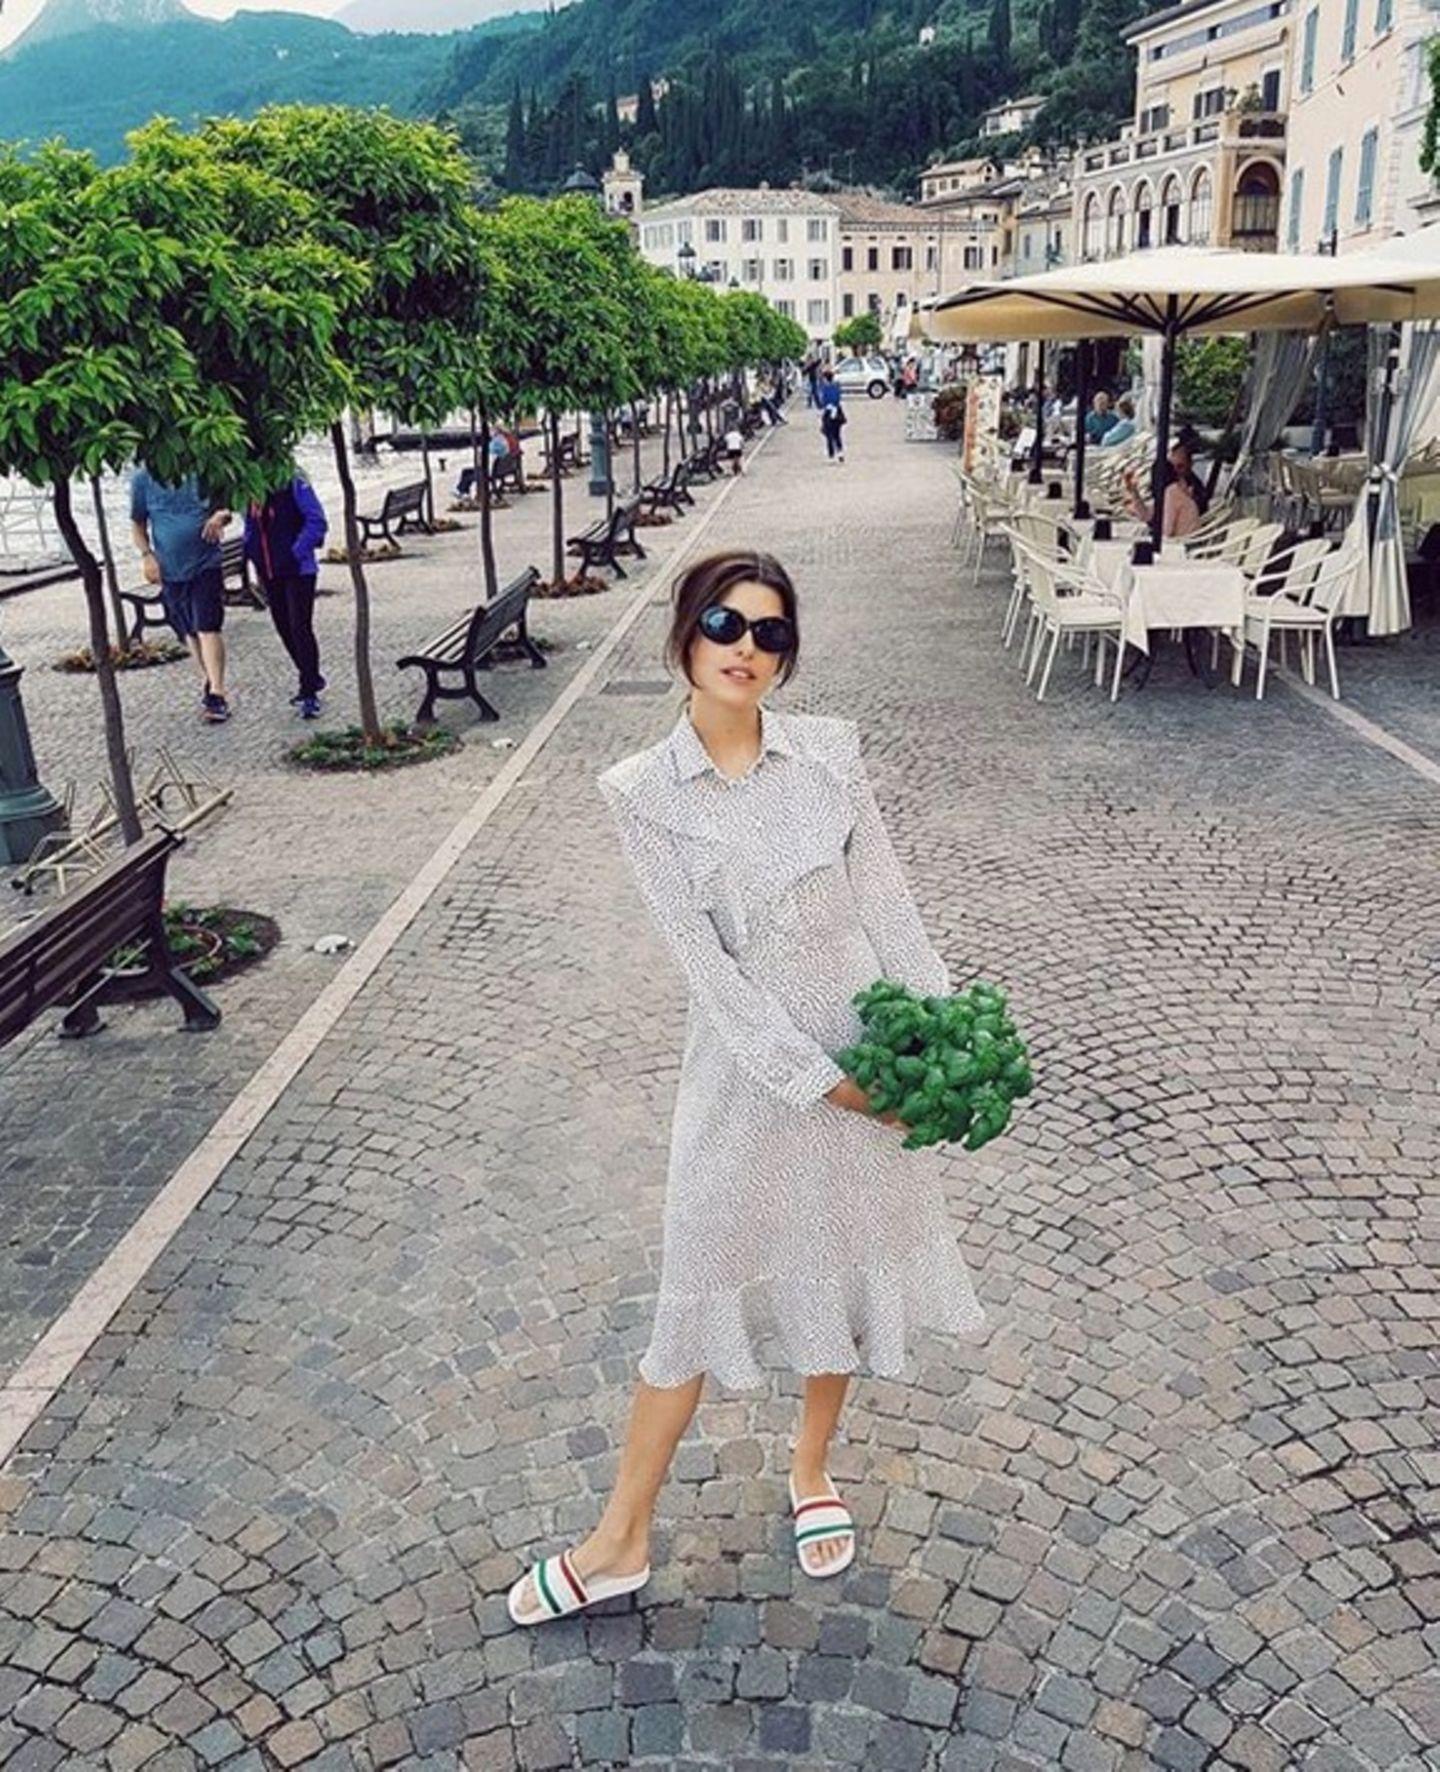 Stilsicher kombiniert Model Marie Nasemann Adiletten zum eleganten Volantkleid.